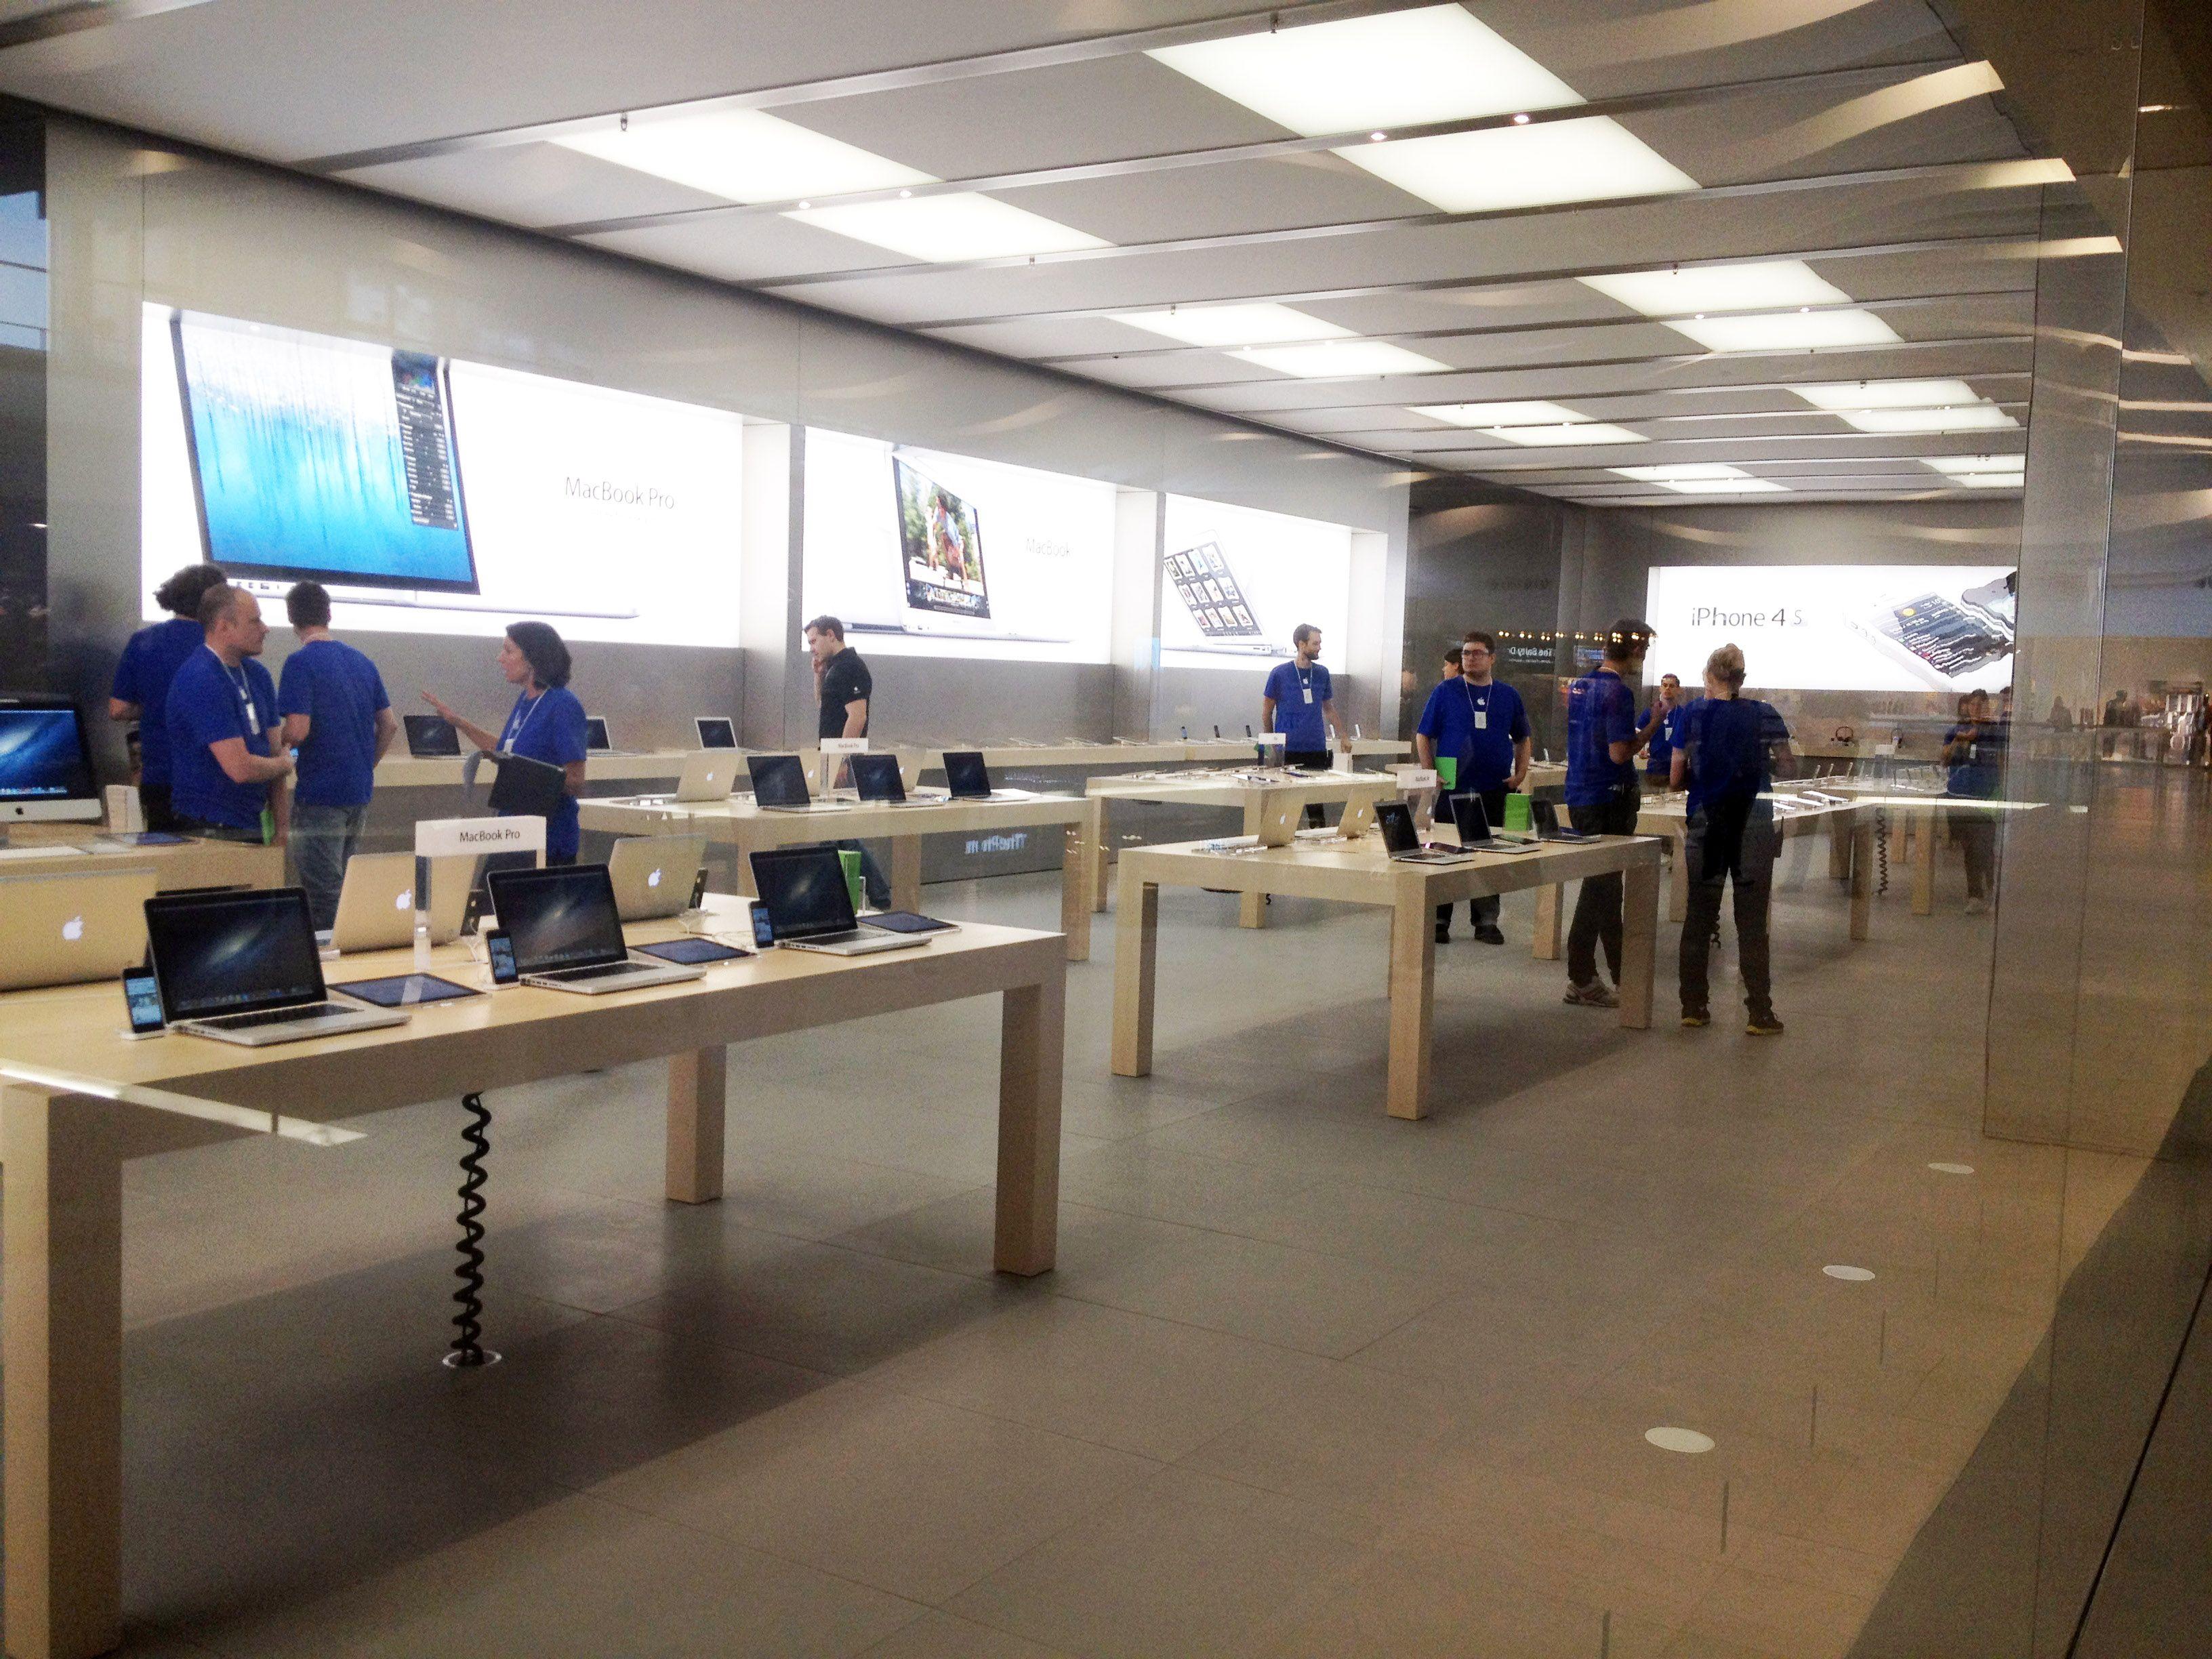 Apple Store New Apple Store Interior Stockholm Apple Store Interior Retail Store Store Interior